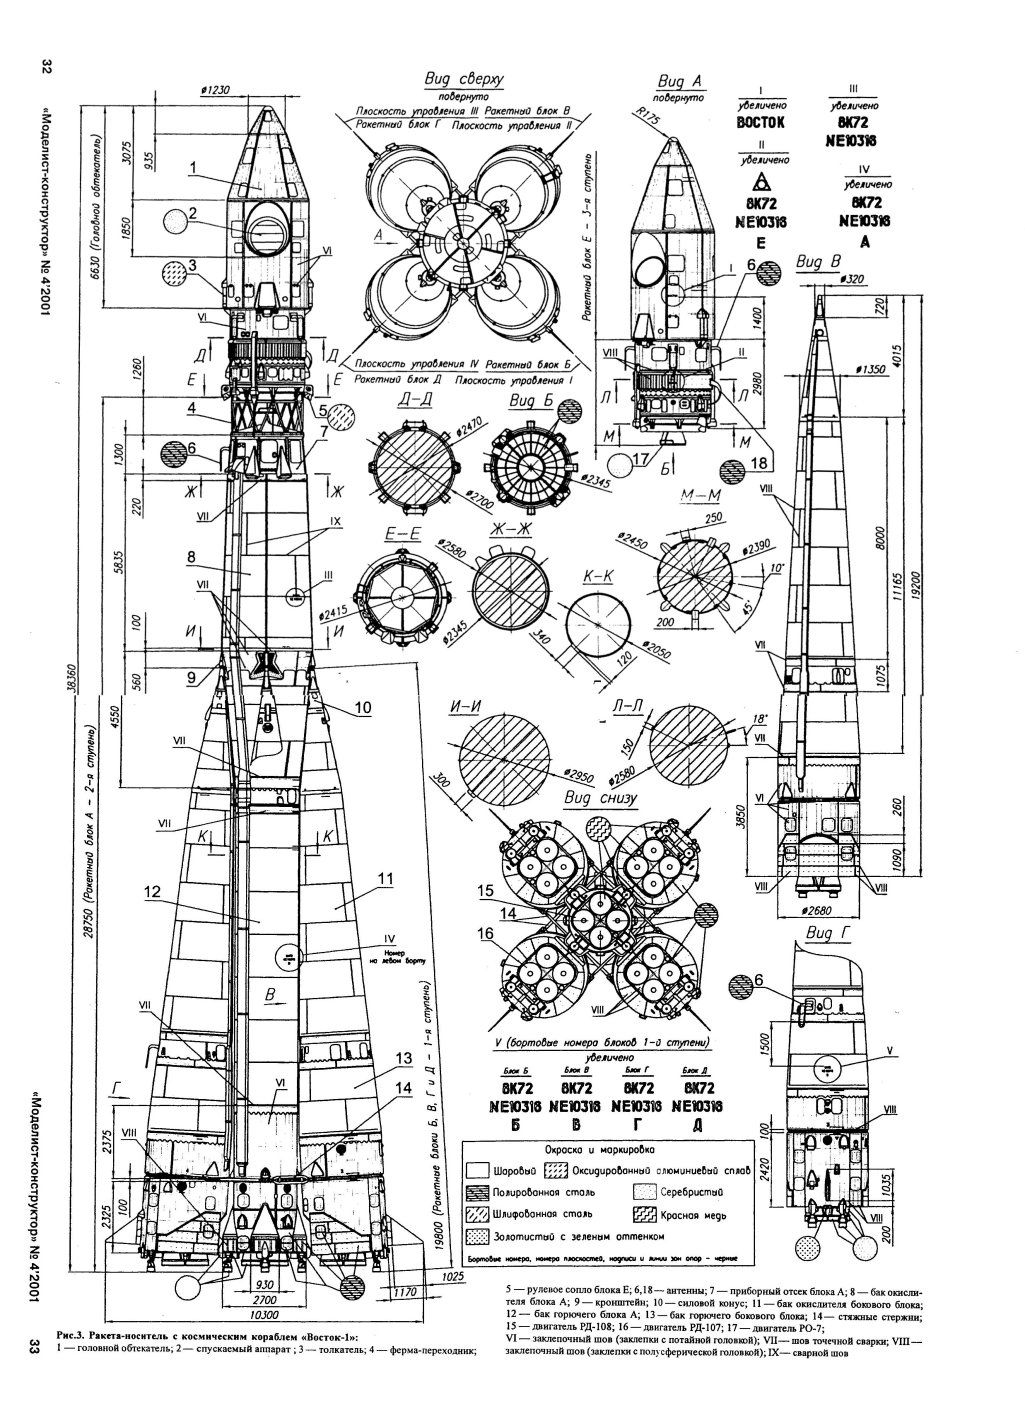 So many space schematics!